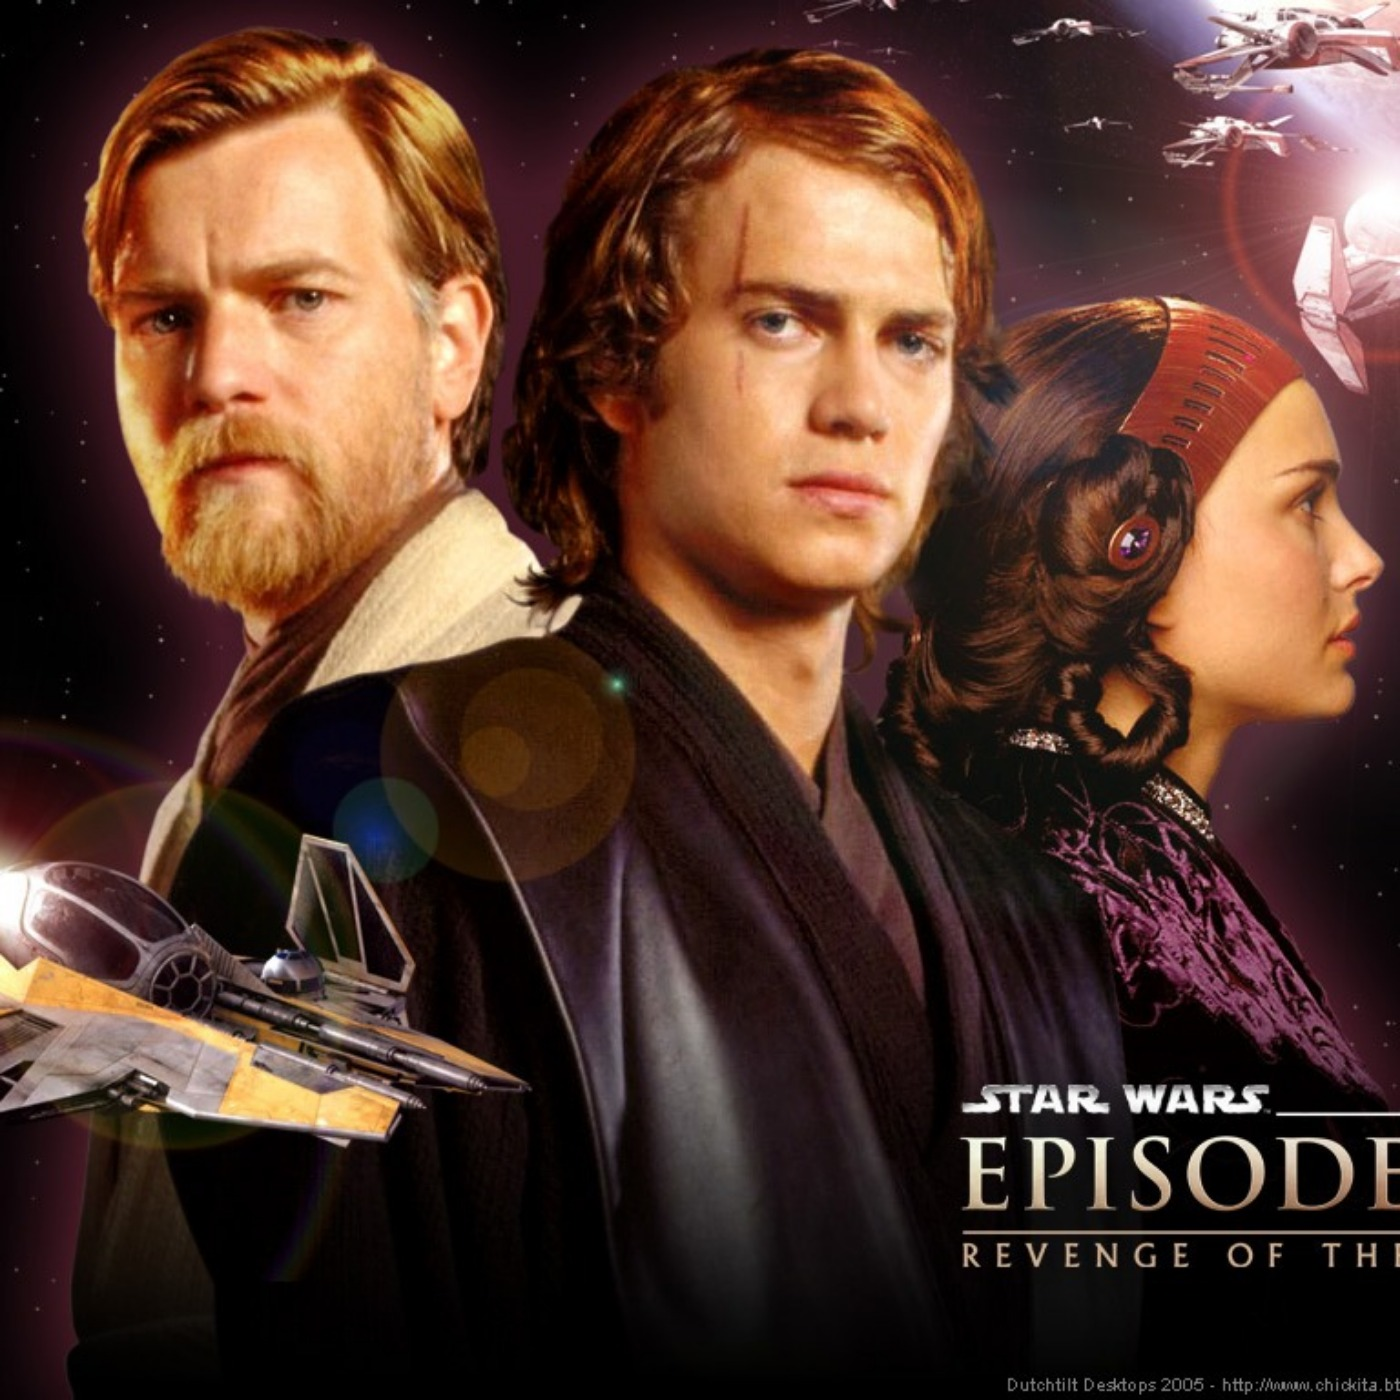 SAGA STAR WARS #11 - LA REVANCHE DES SITHS - EPISODE 3 - LE FILM